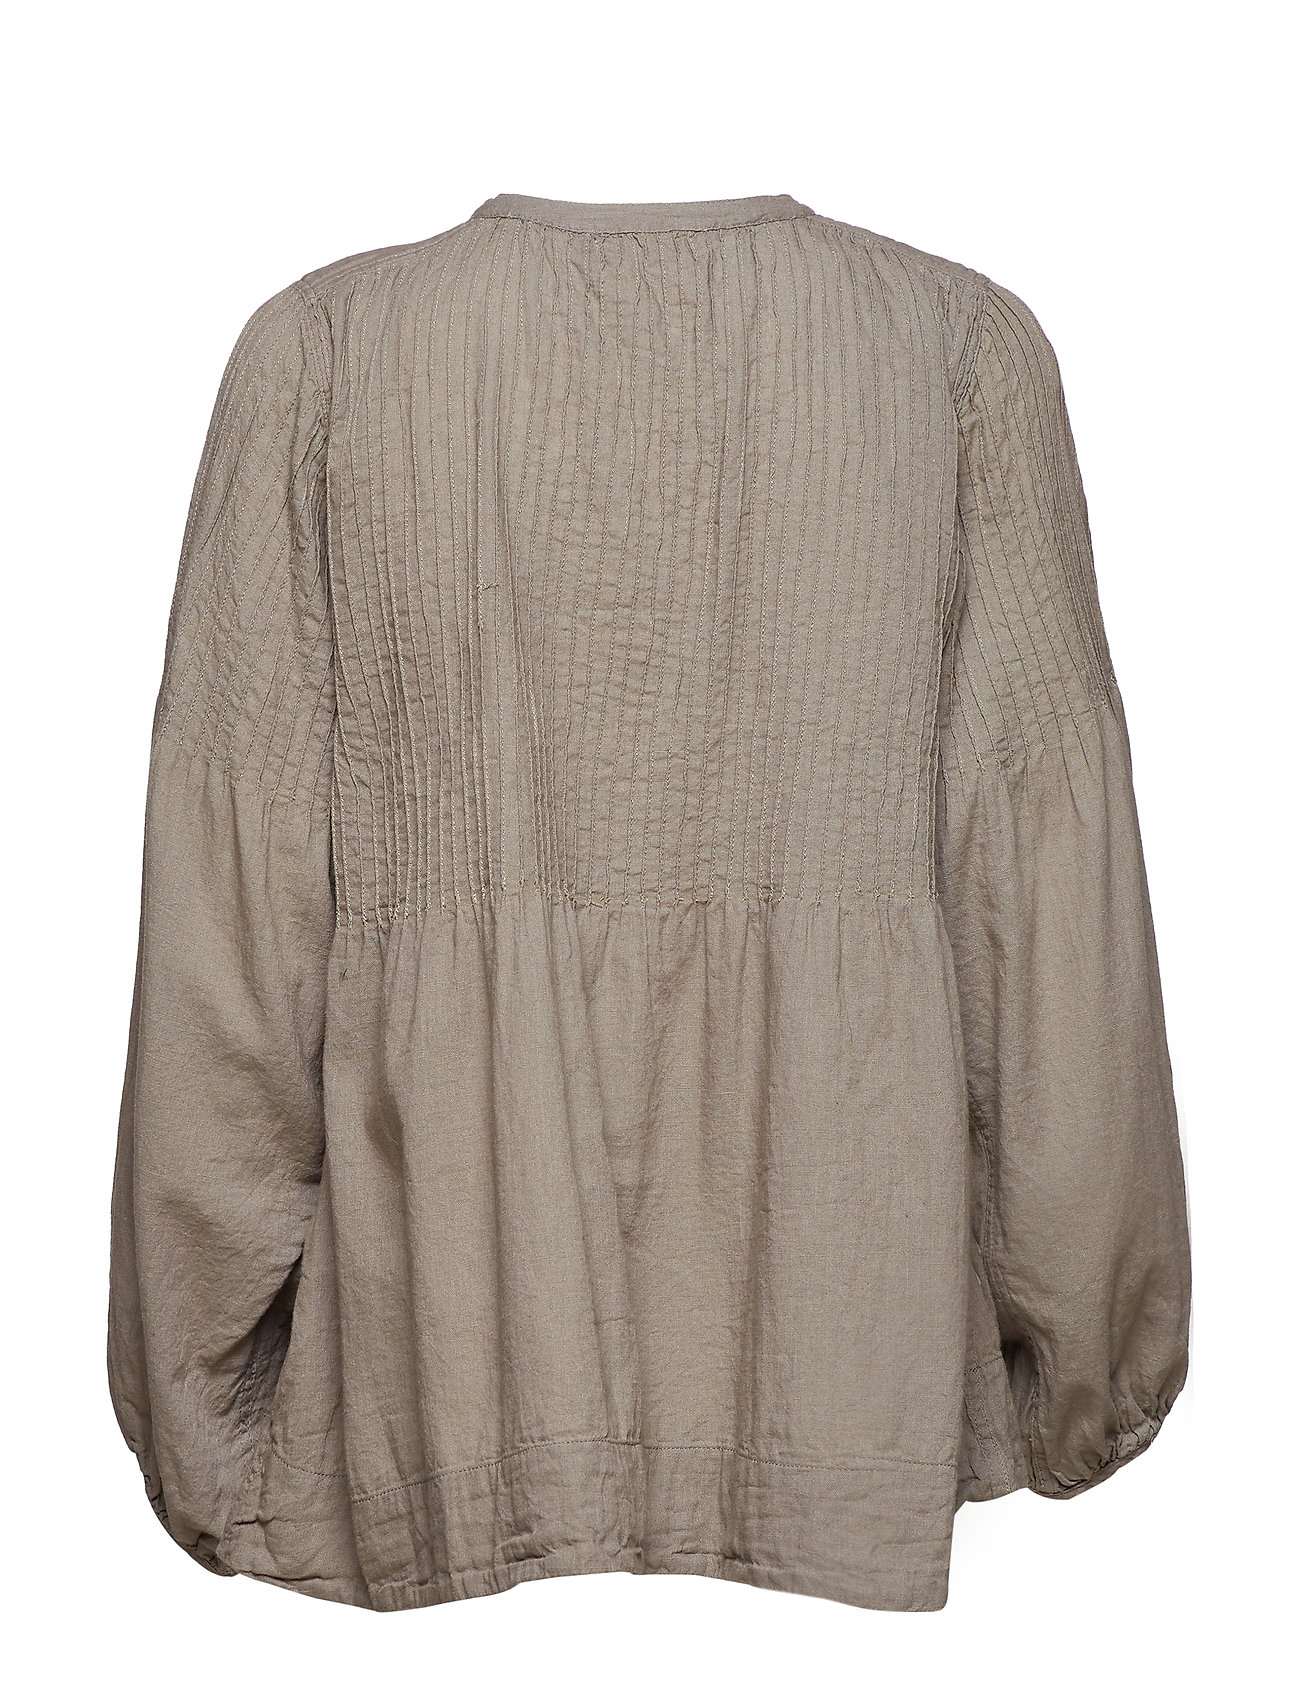 Topash GreyRabens Pintuck Cotton Saloner Cotton KF1lJc3T